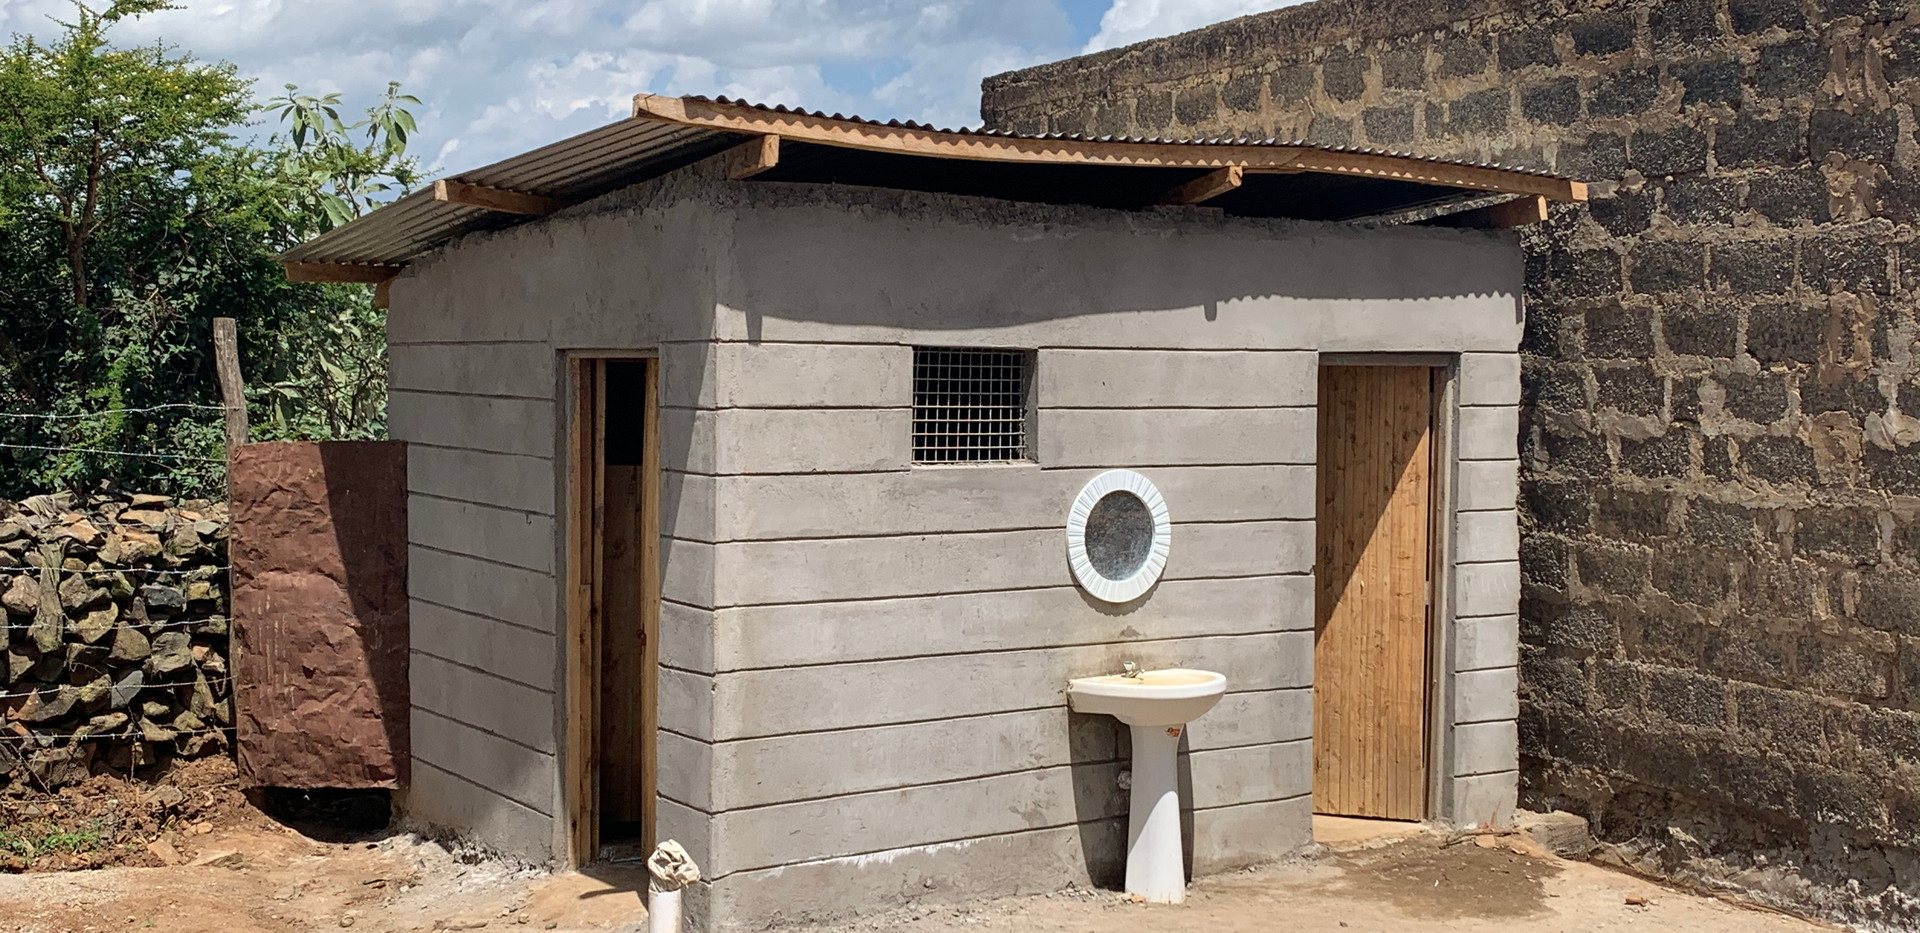 The new bathhouse